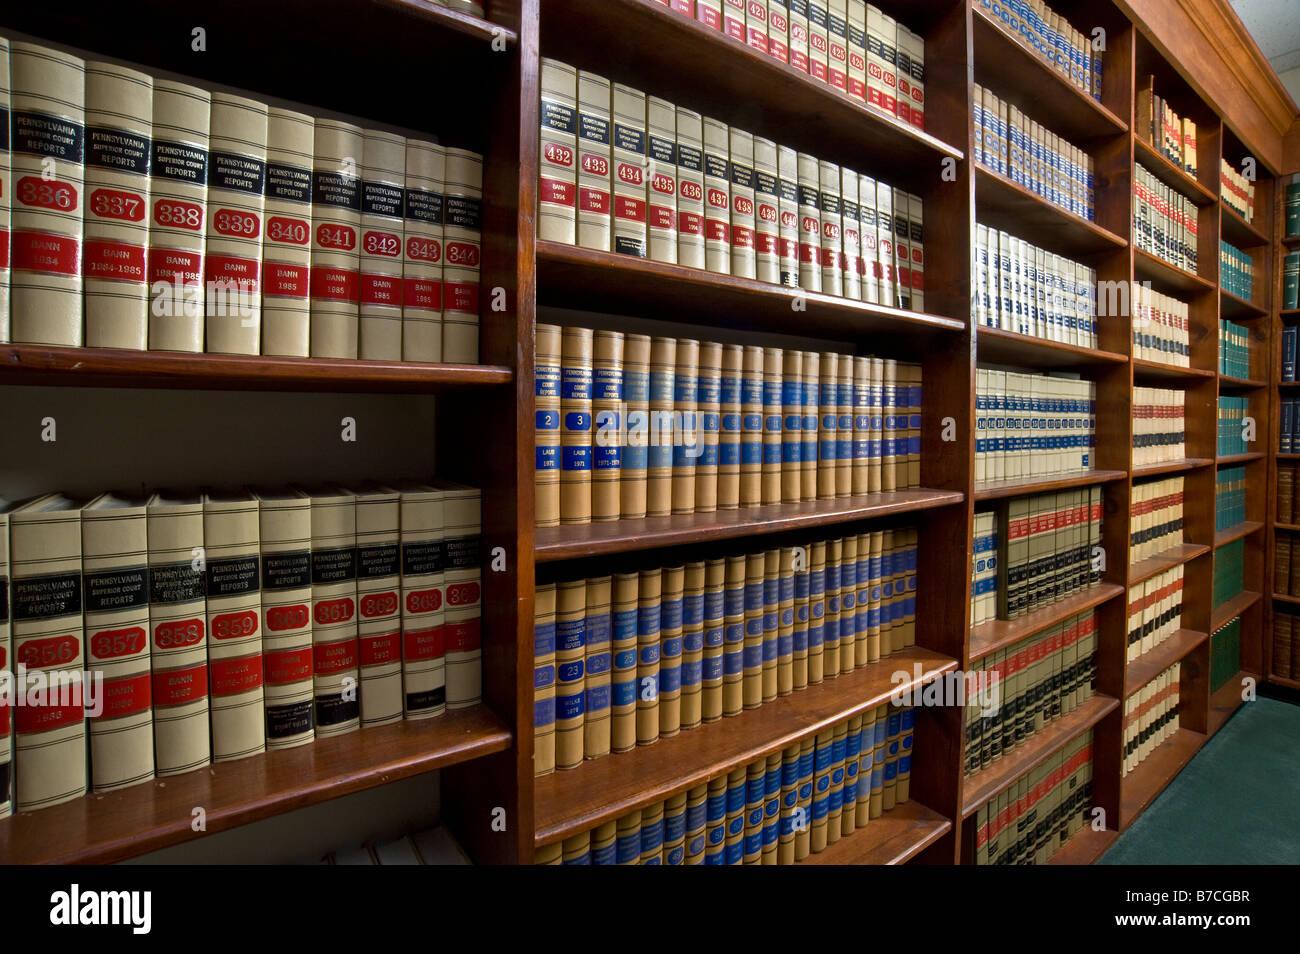 Book Law School Library Room